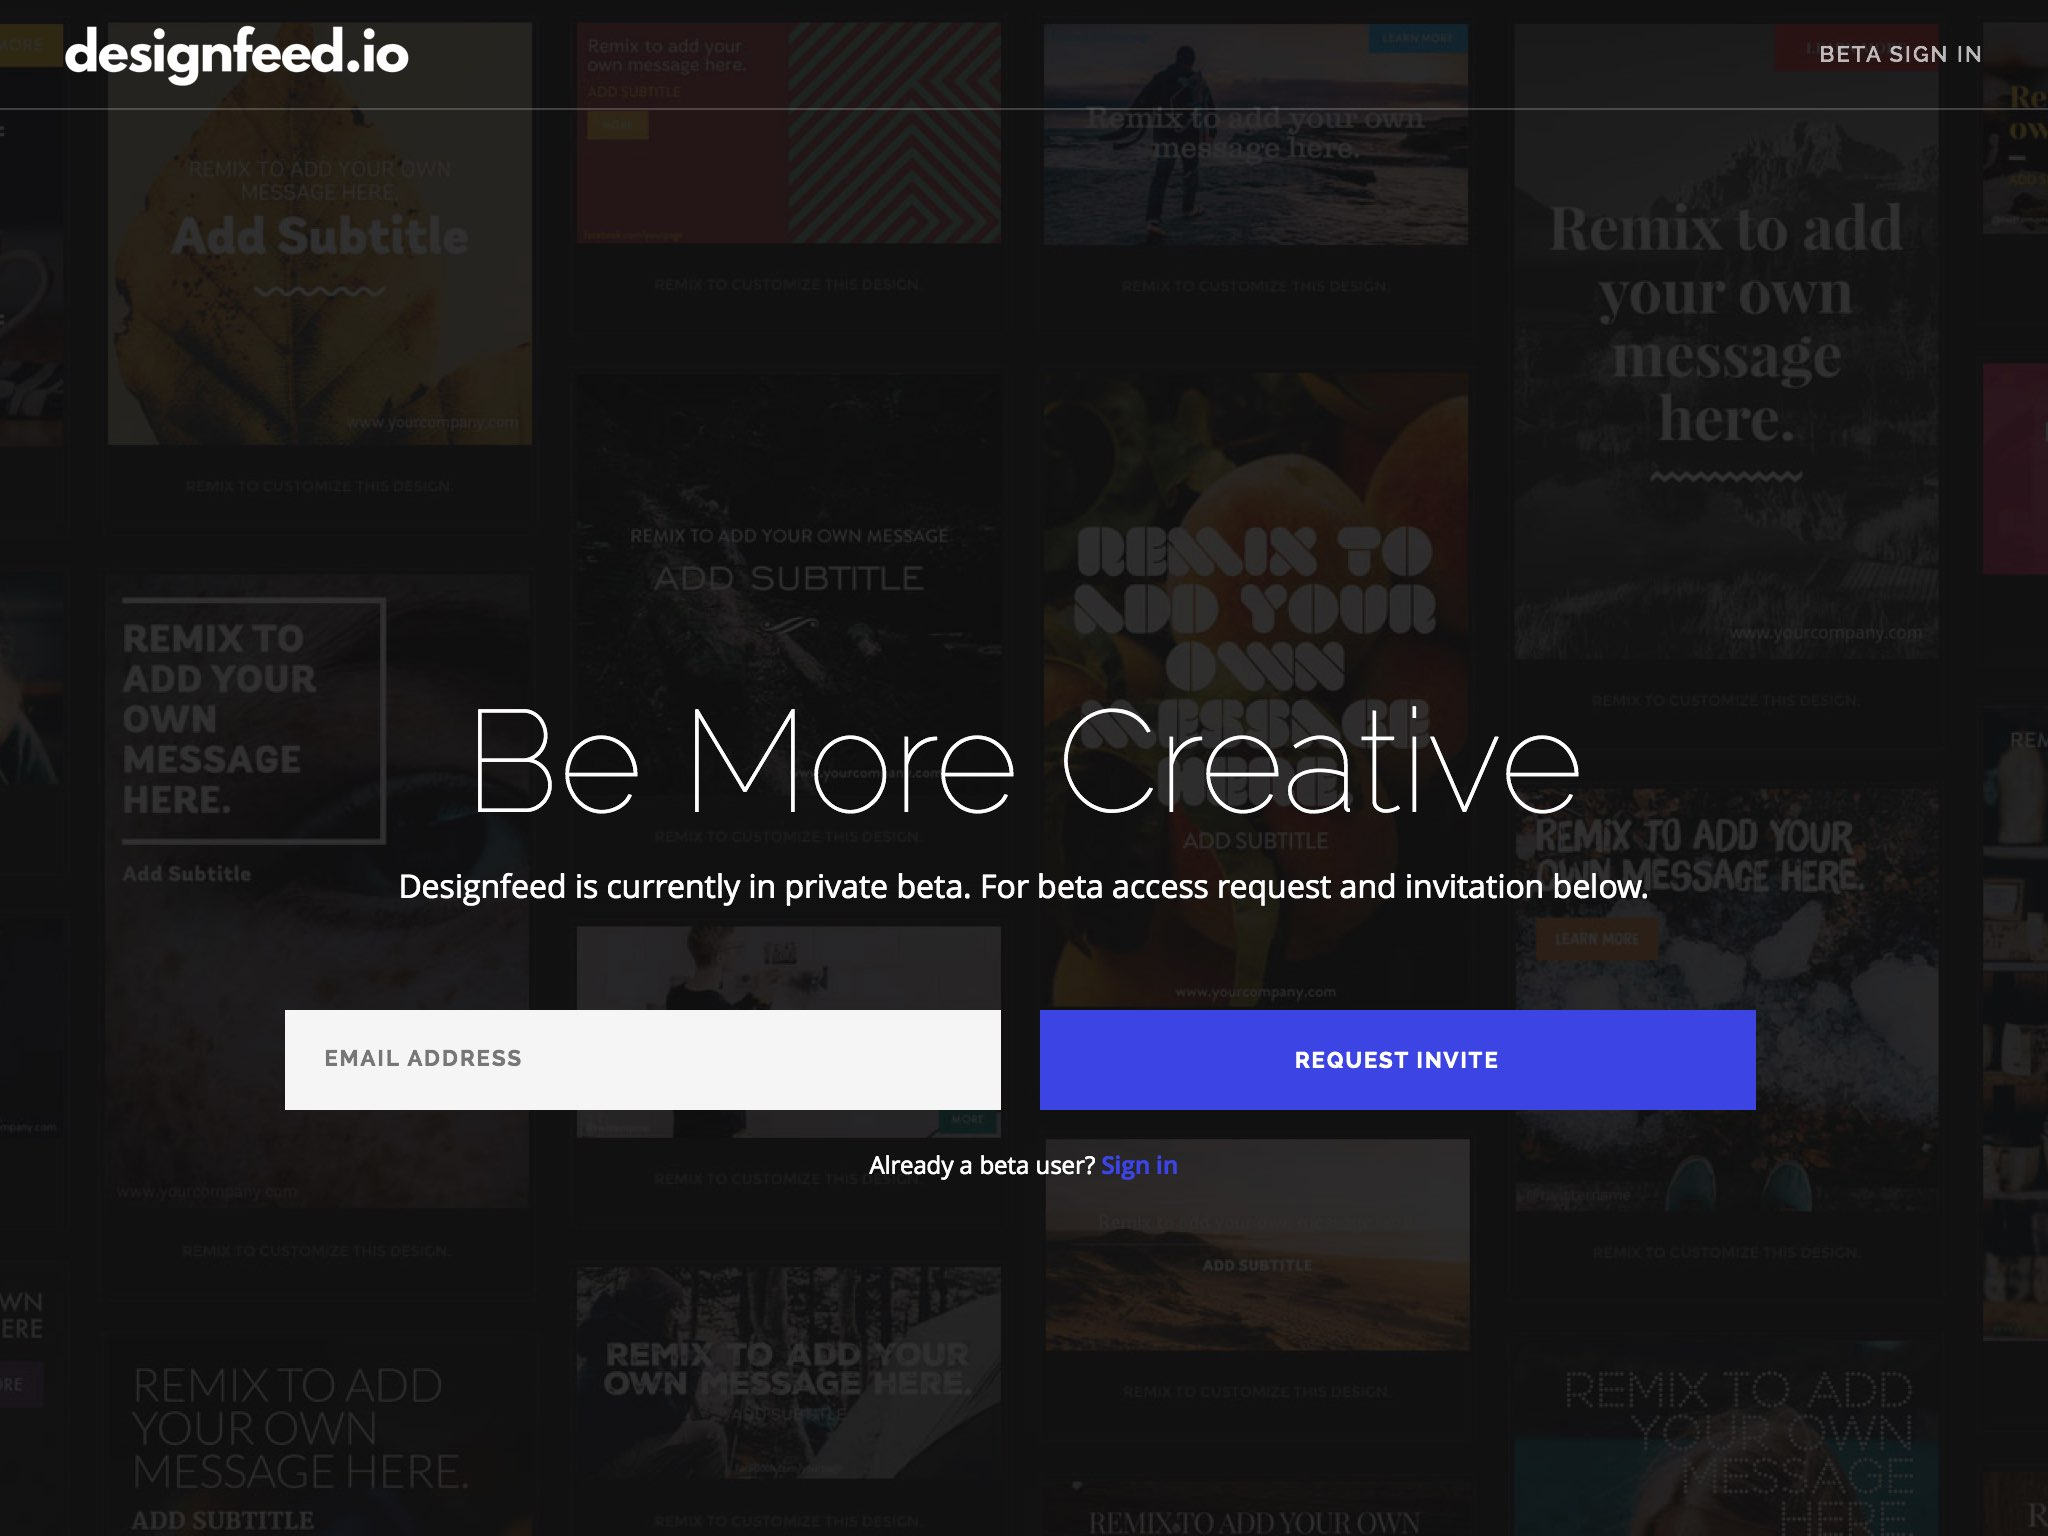 Design-Productivity-Tools-DesignFeed